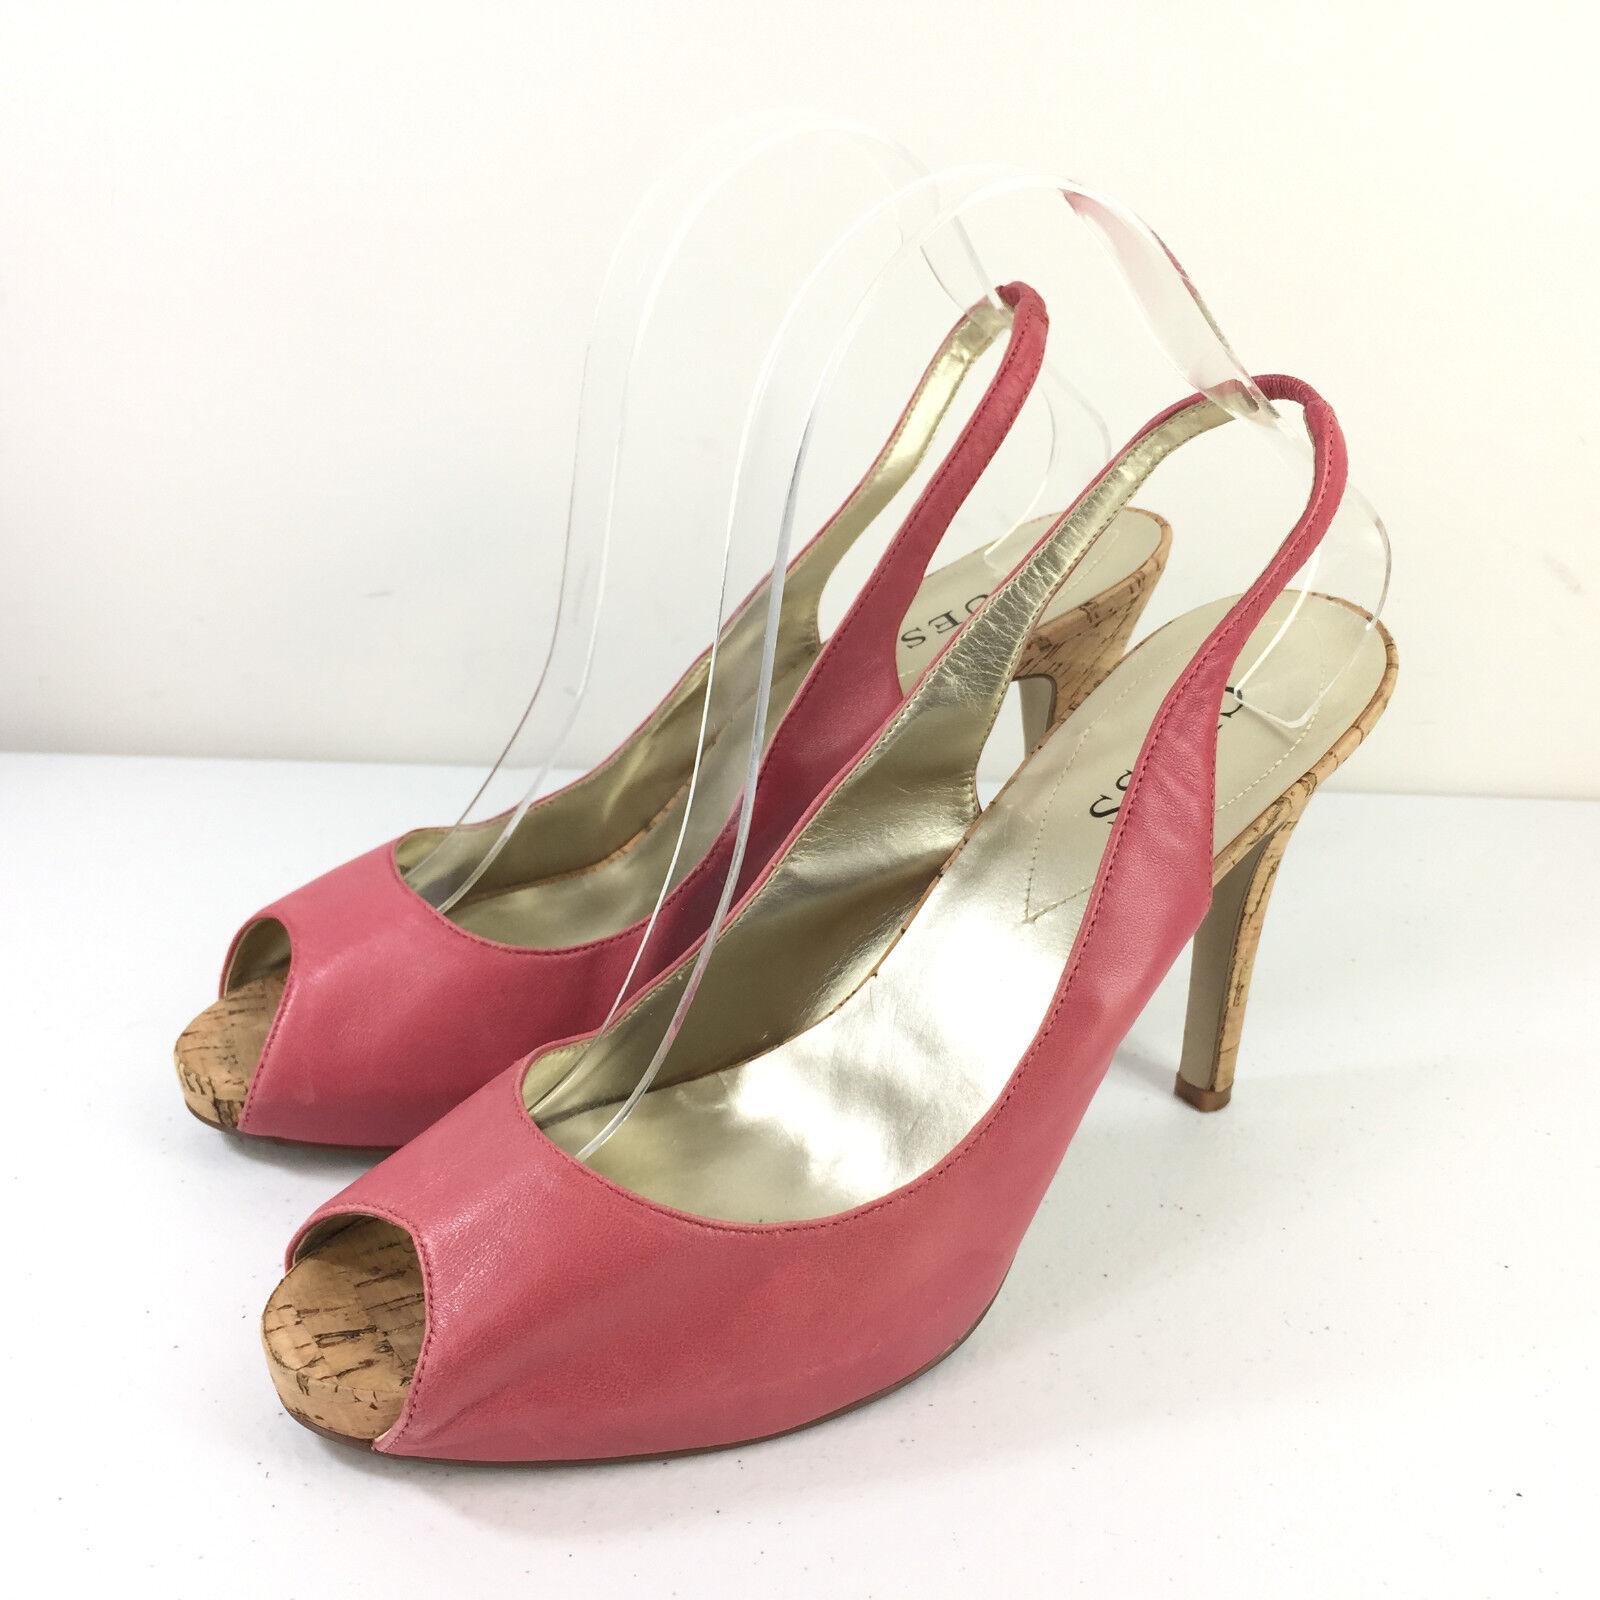 Guess Pink Slingback 9.5 Heels peep Toe Leather Career Cocktail EUC